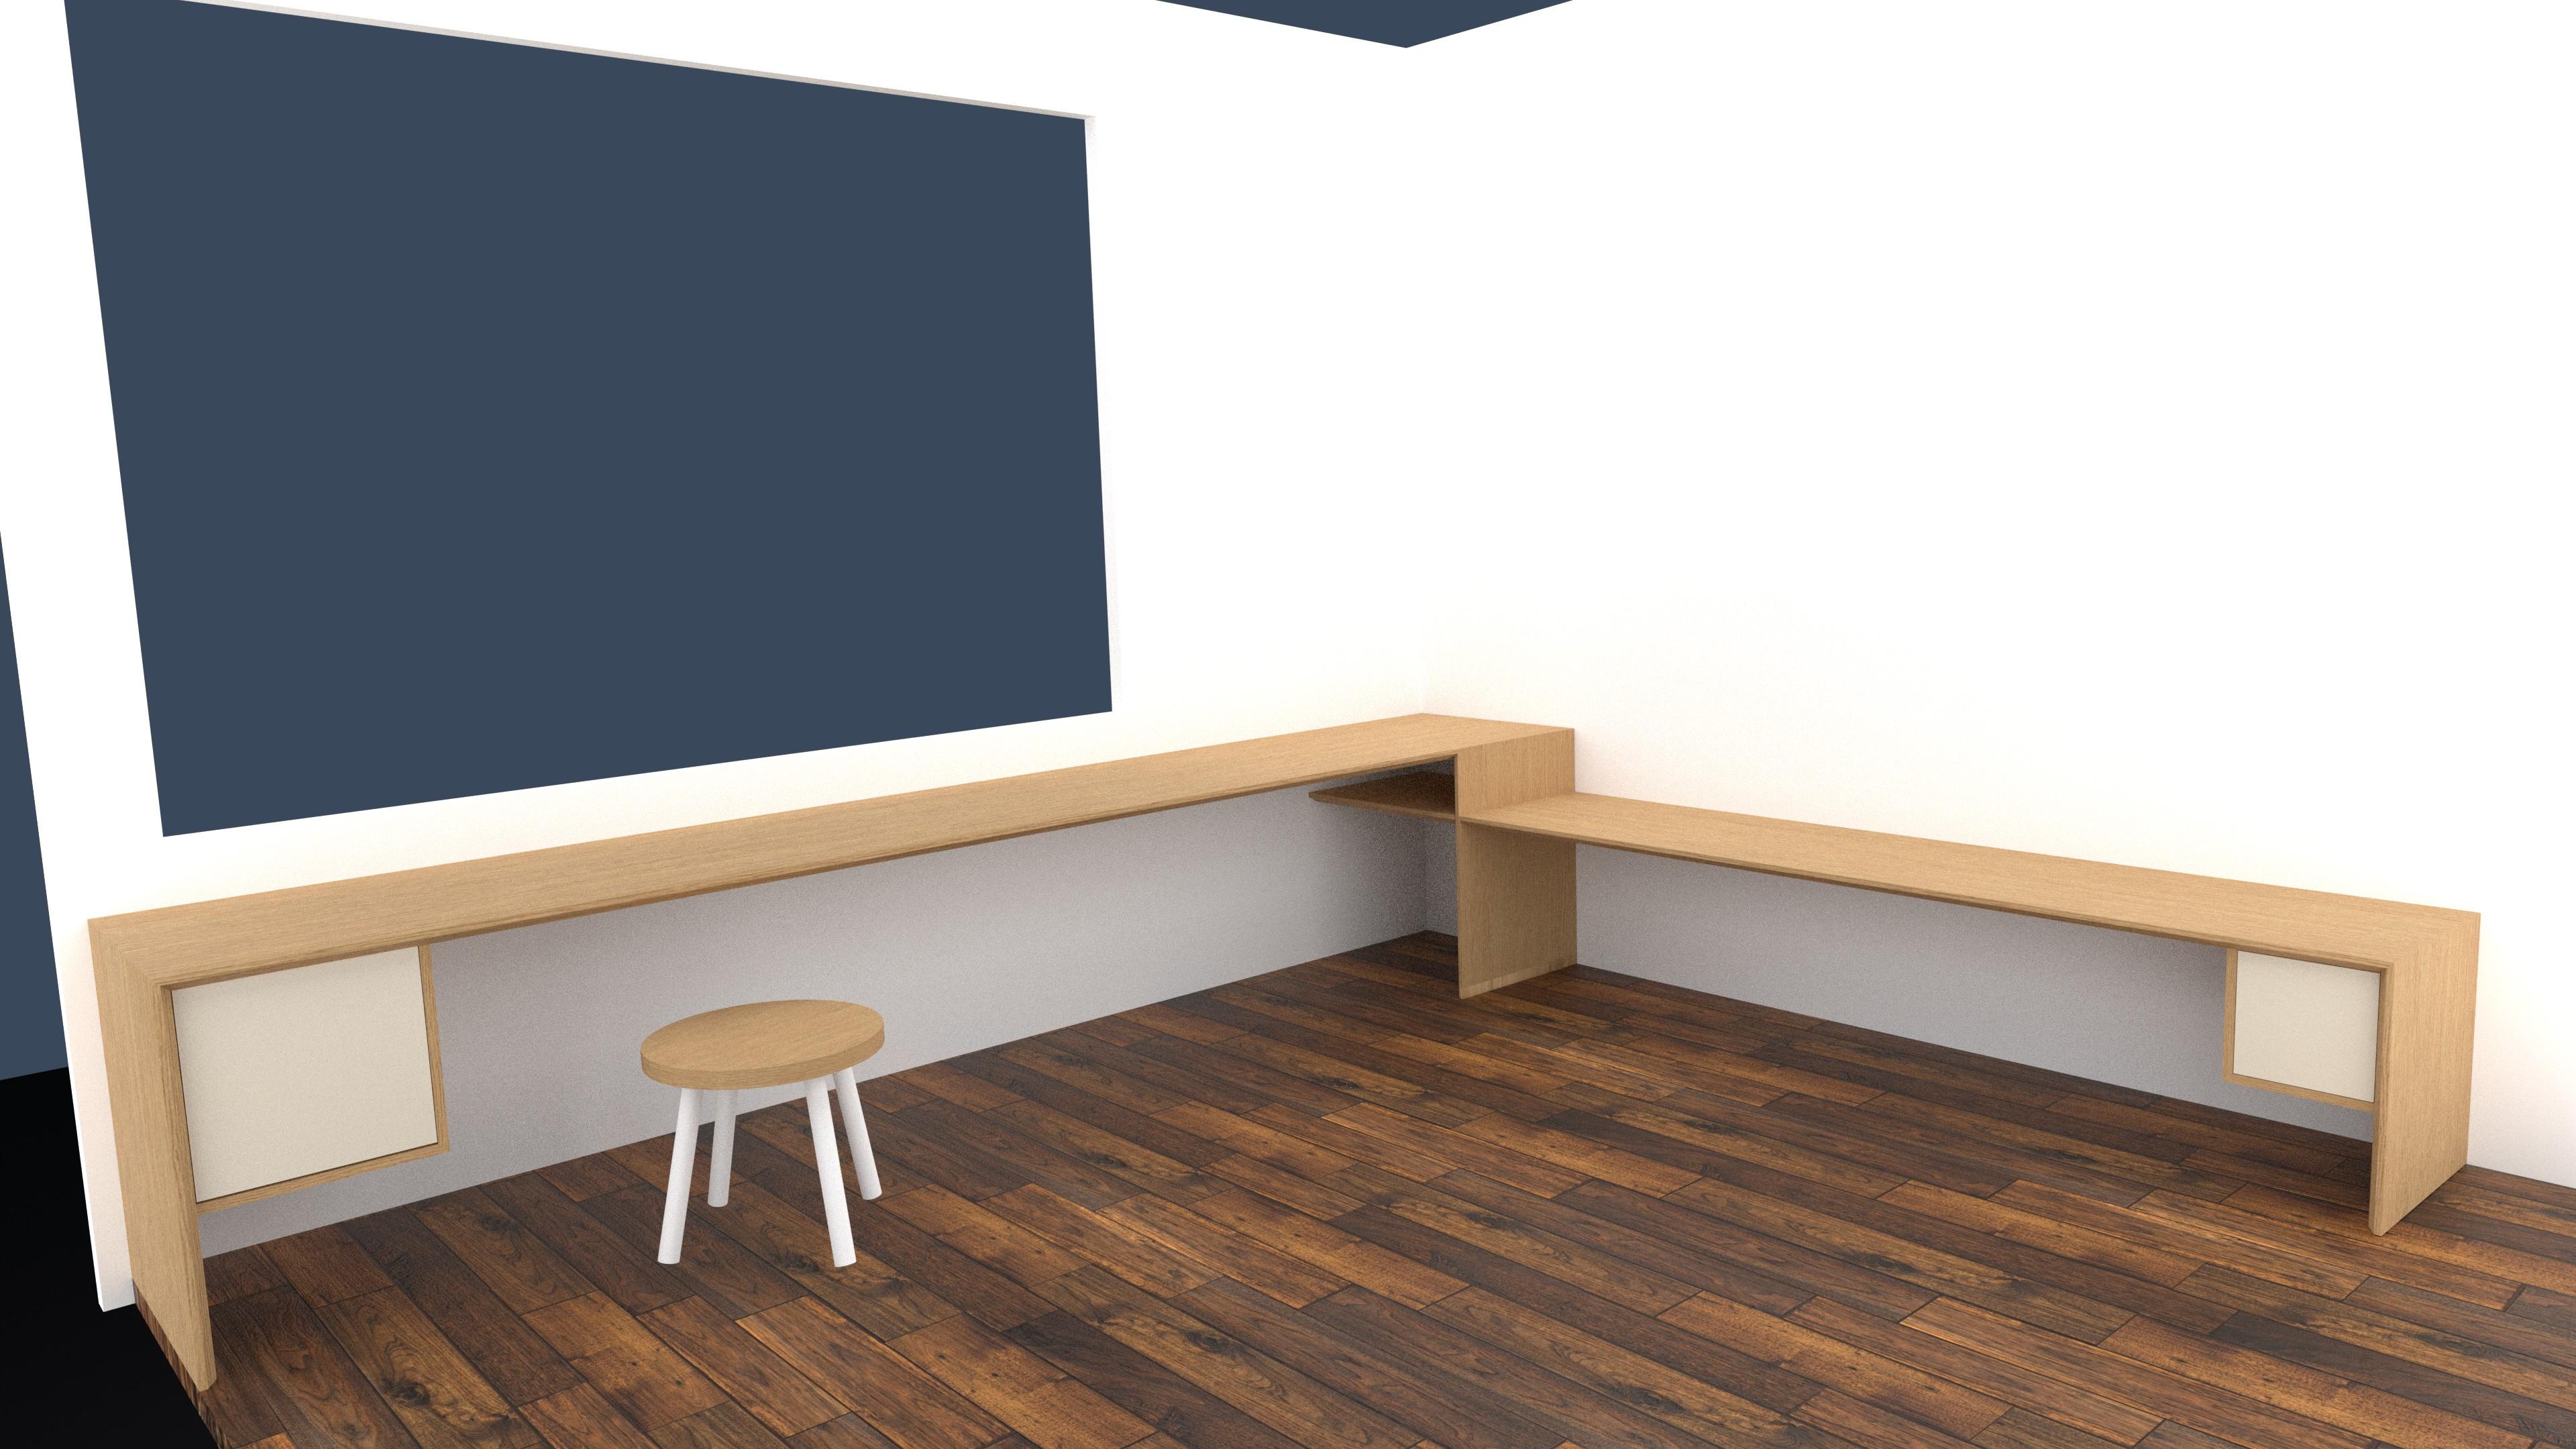 Design Bureau Woonkamer : Bureau woonkamer d w